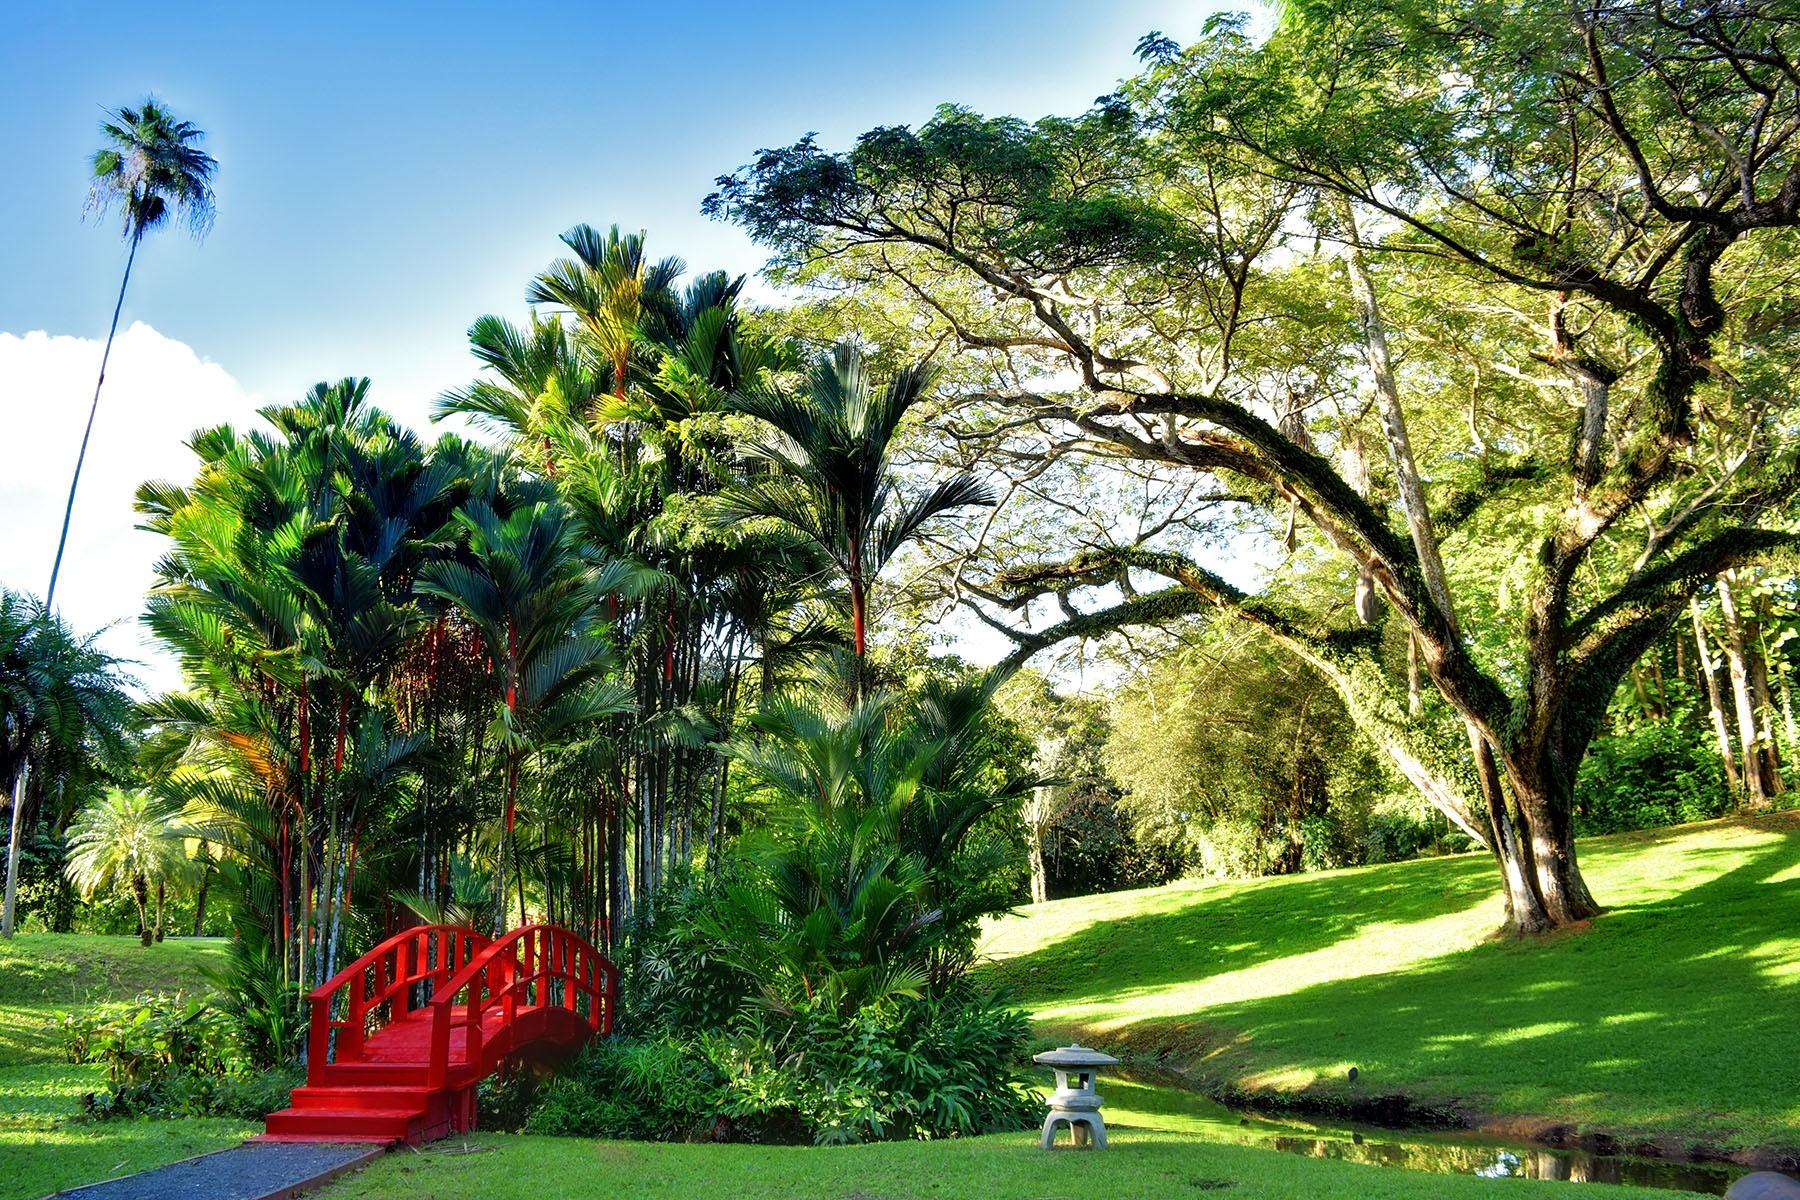 Garden2 by Rosa J. Soto Amill